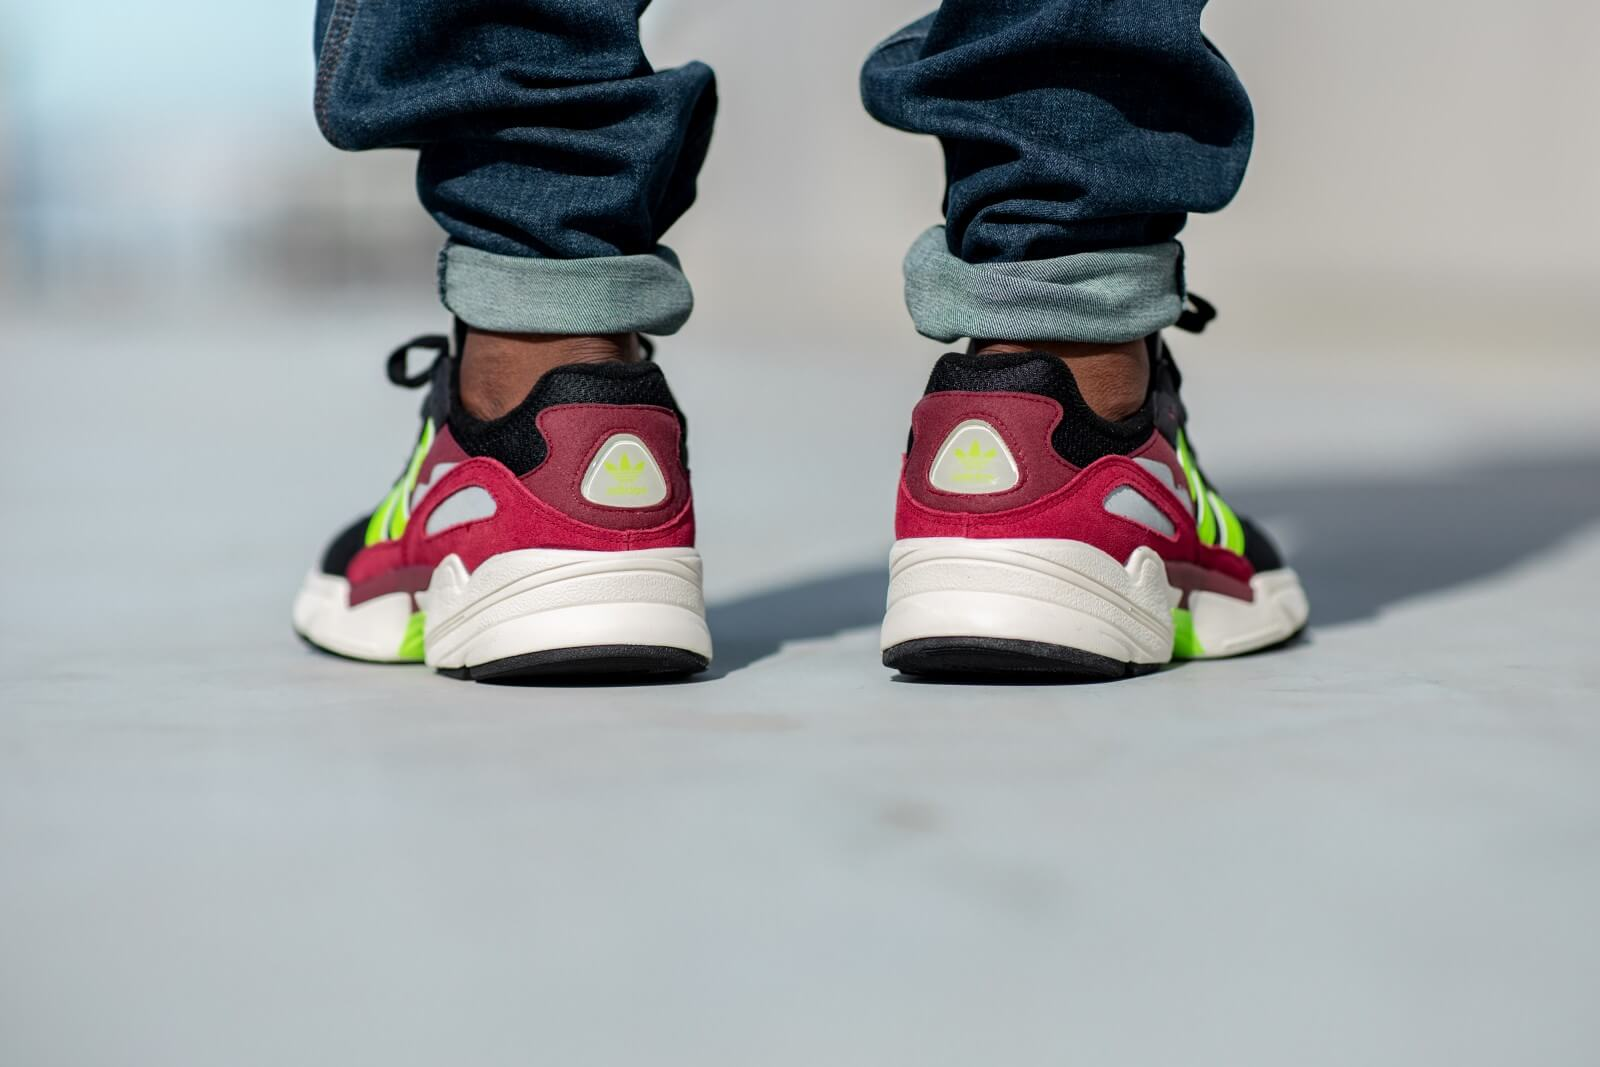 Adidas Yung-96 Black/Burgundy-Volt - EE7247